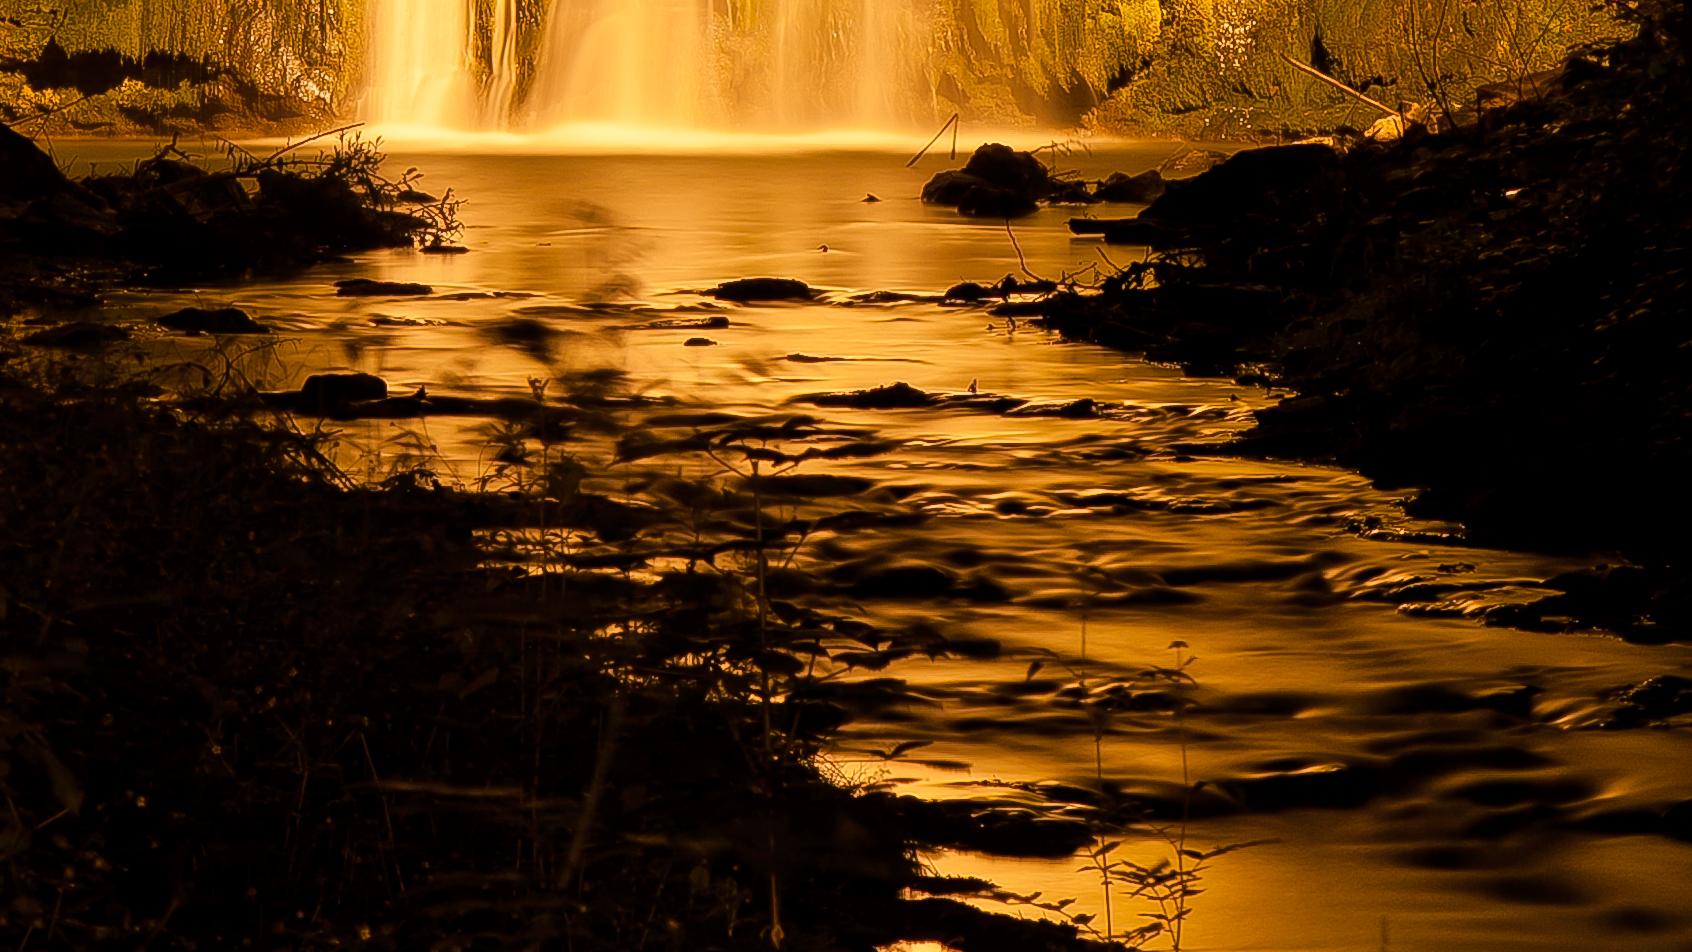 Wasserfall in Heilbad Heiligenstadt ...